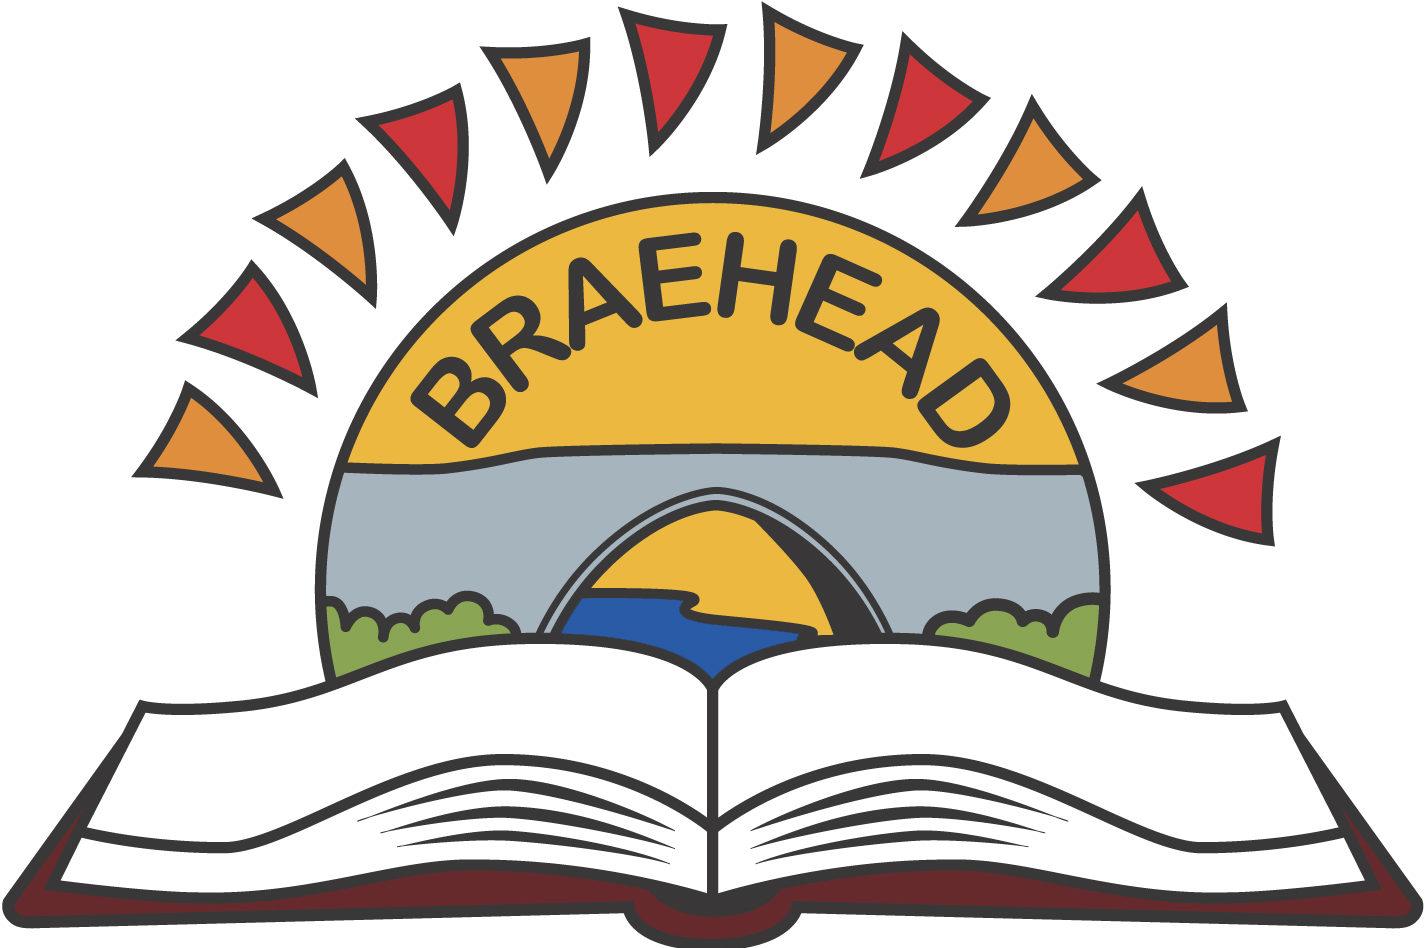 Braehead School